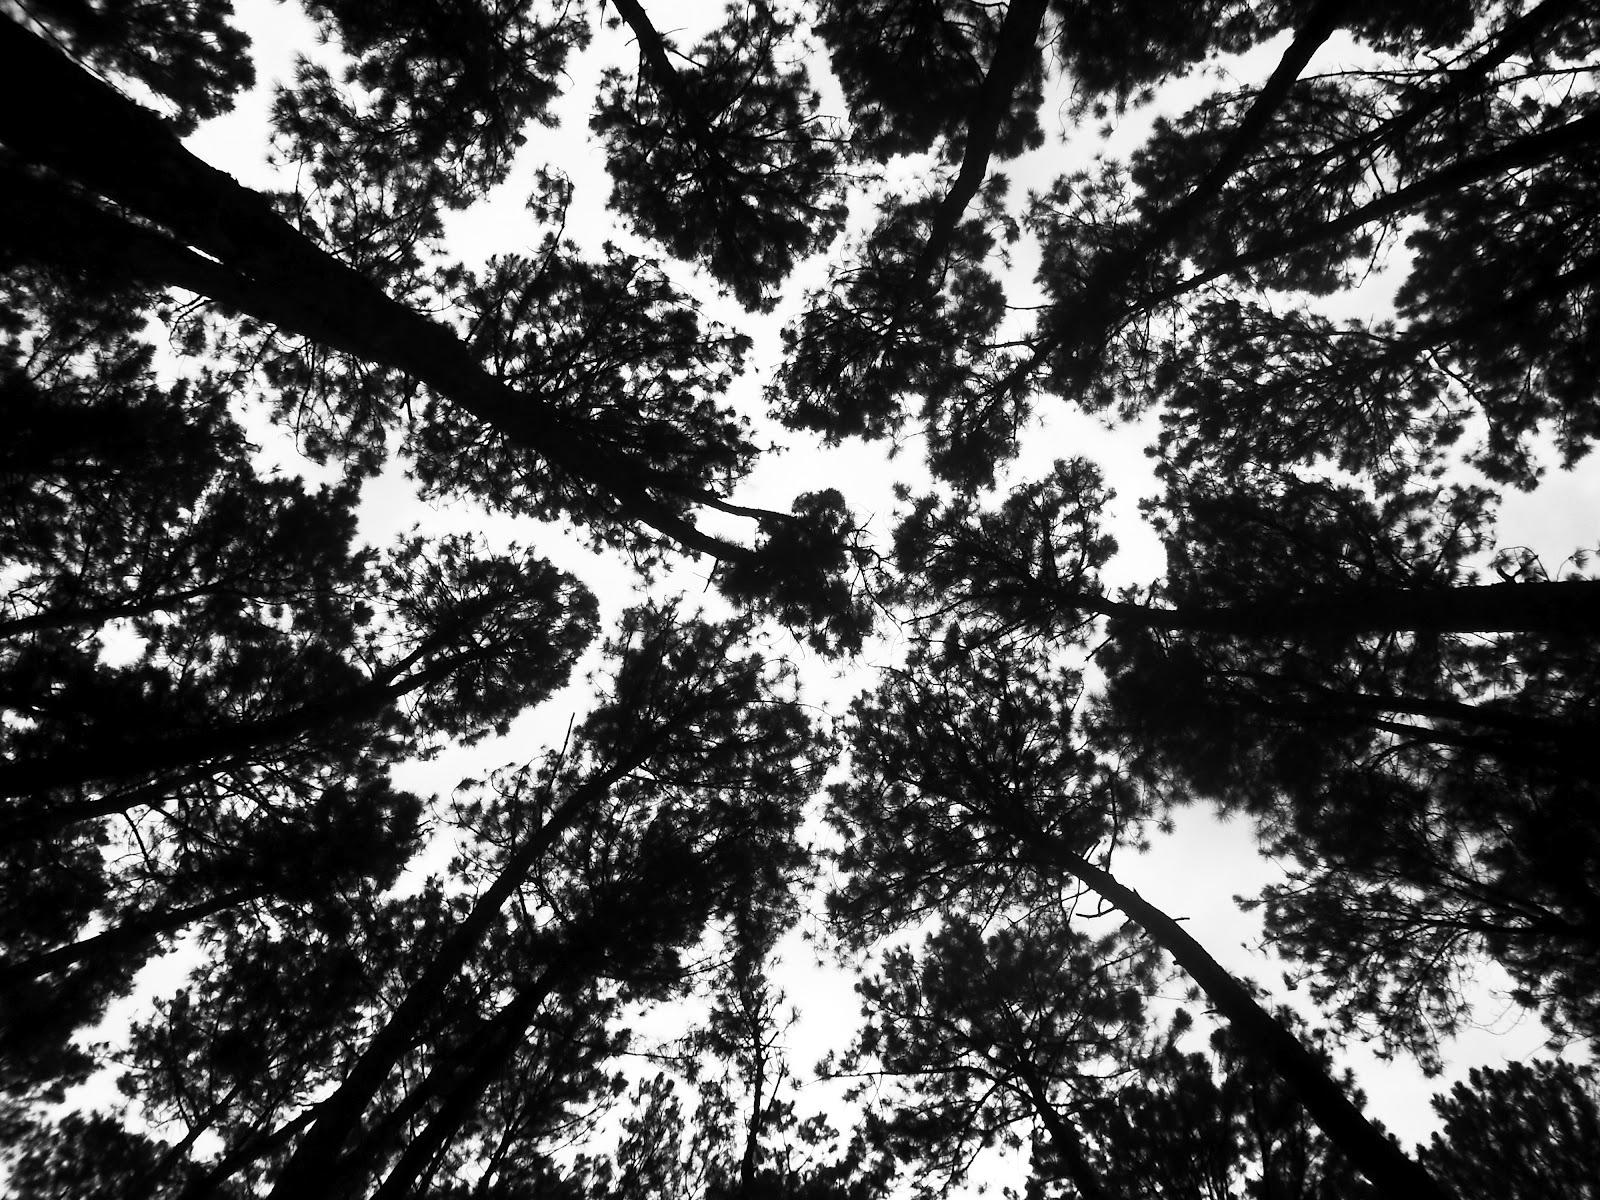 Havia um Bosque